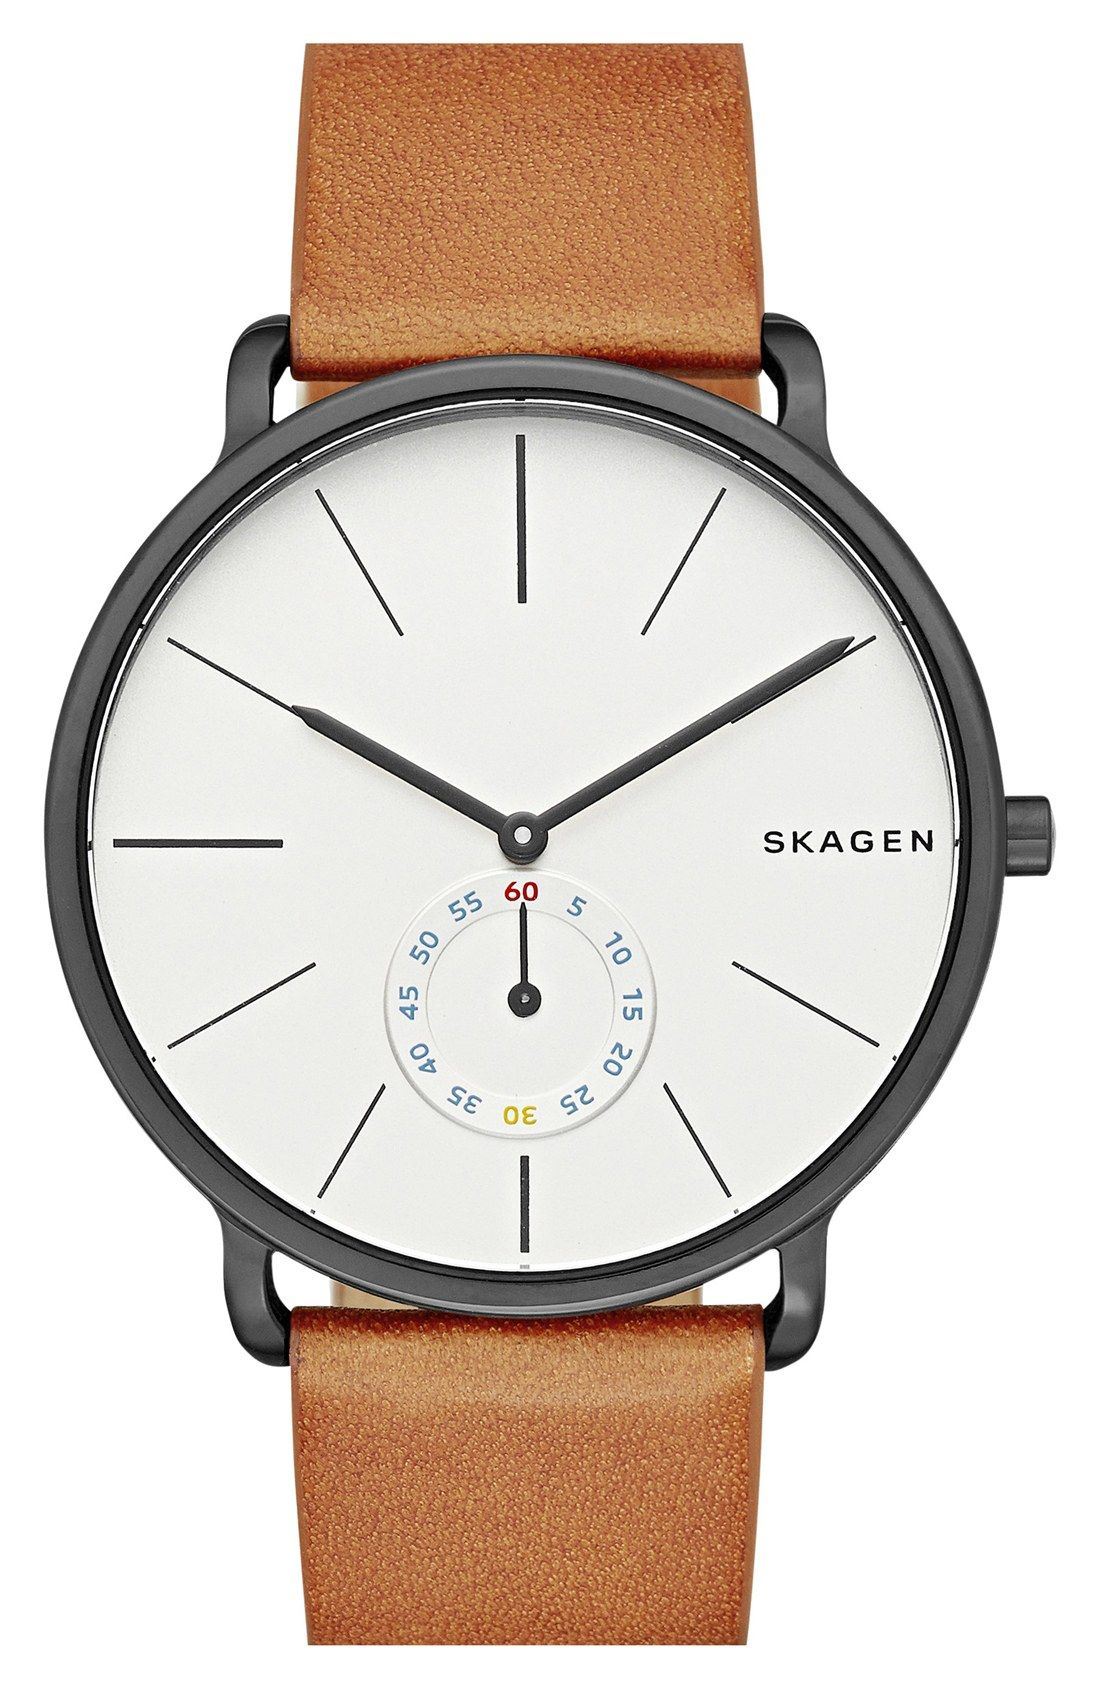 dfa76a4068c Skagen  Hagen  Leather Strap Watch